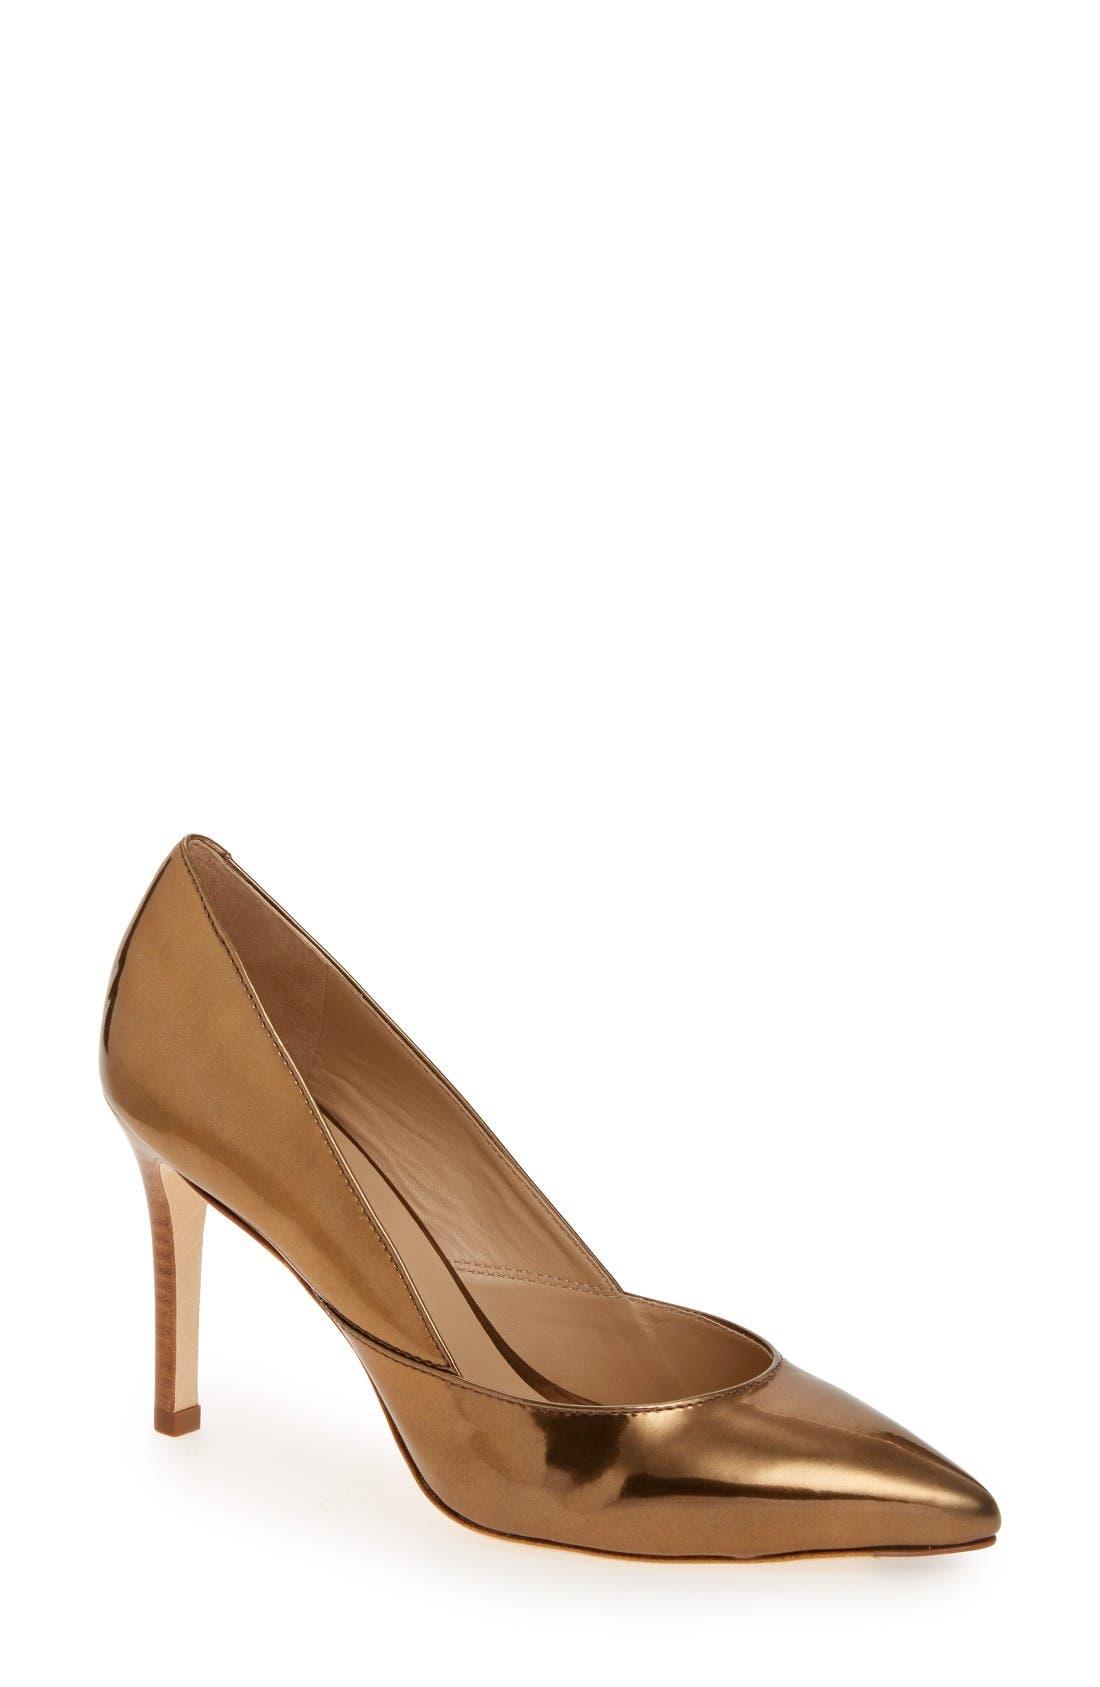 Alternate Image 1 Selected - Johnston & Murphy 'Vanessa' Pointy Toe Leather Pump (Women)